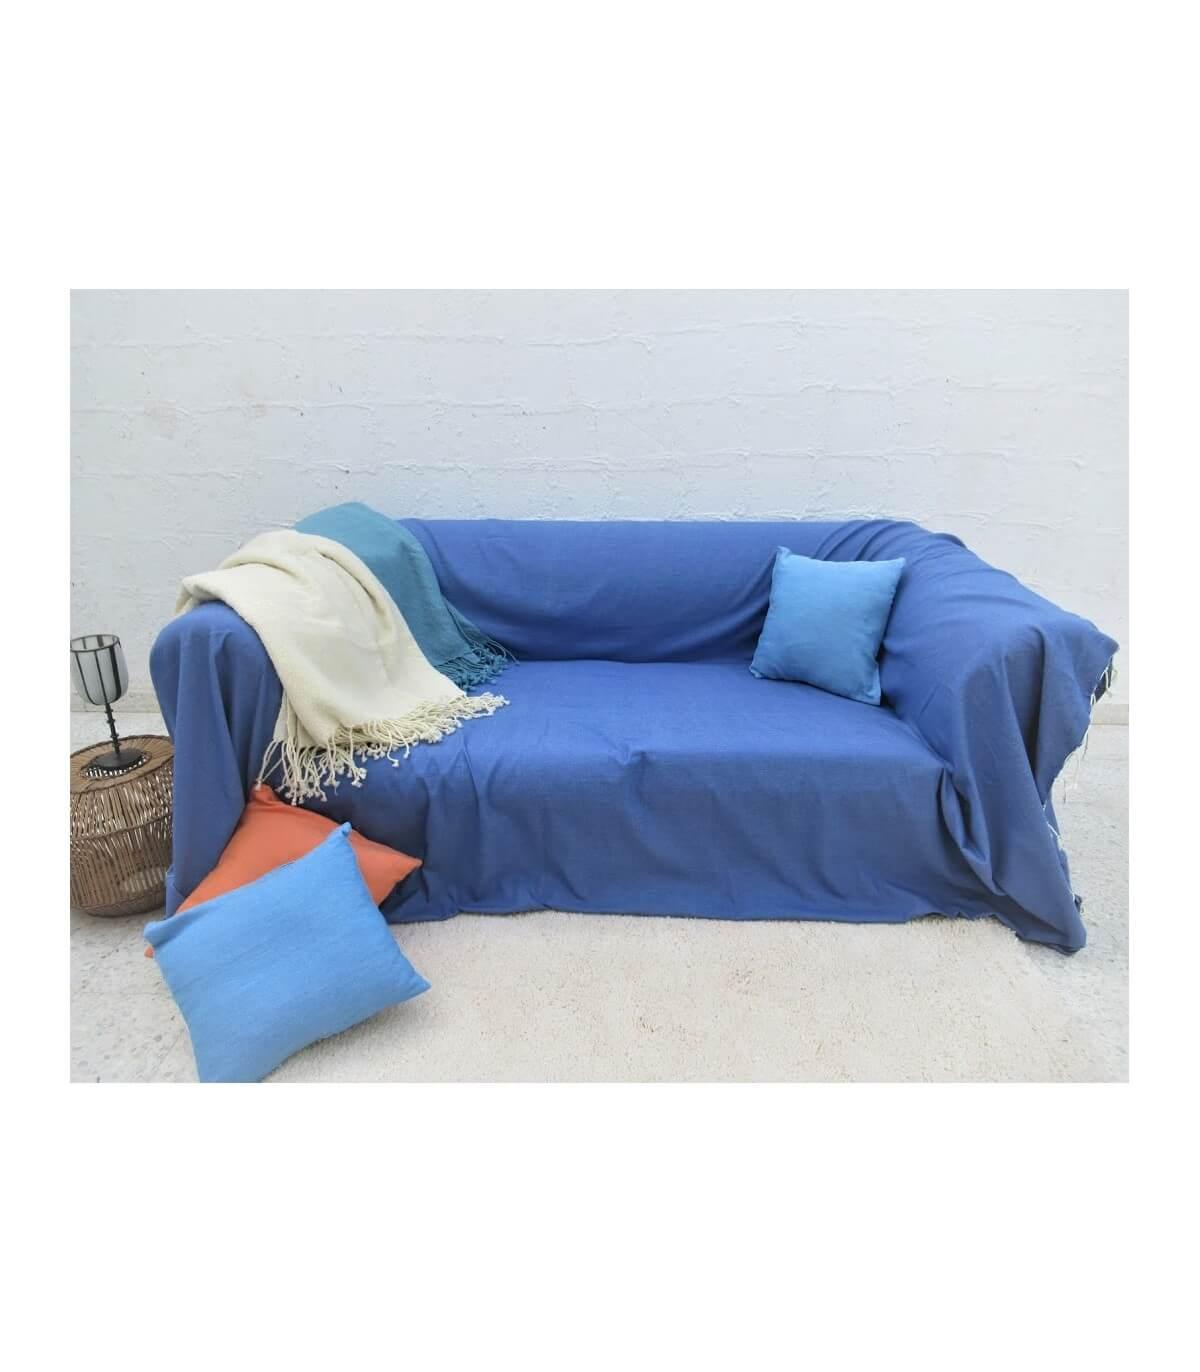 Full Size of überwurf Sofa Sofaberwurf Blautagesdecke Couch Blau Baumwolle Langes Barock Abnehmbarer Bezug Großes Comfortmaster Himolla Antikes Auf Raten Terassen Big Sofa überwurf Sofa